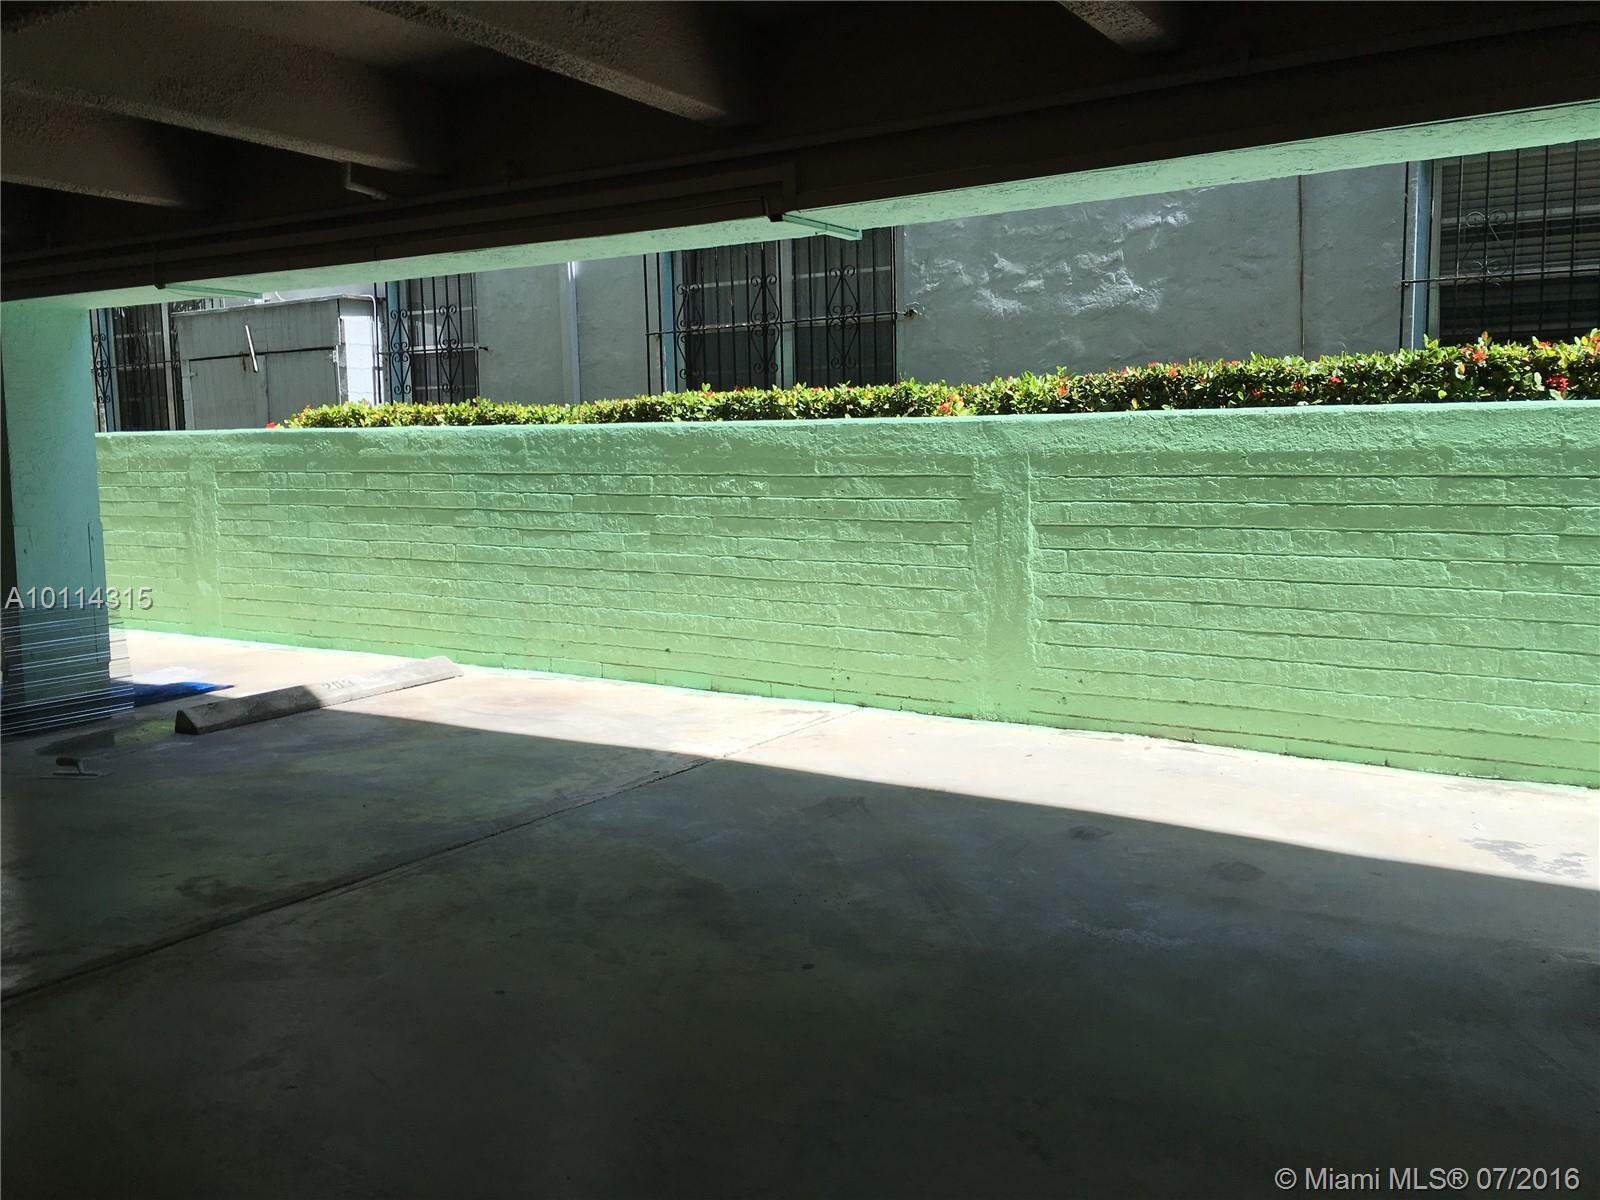 1530 PENNSYLVANIA AV # 203, Miami Beach, FL 33139